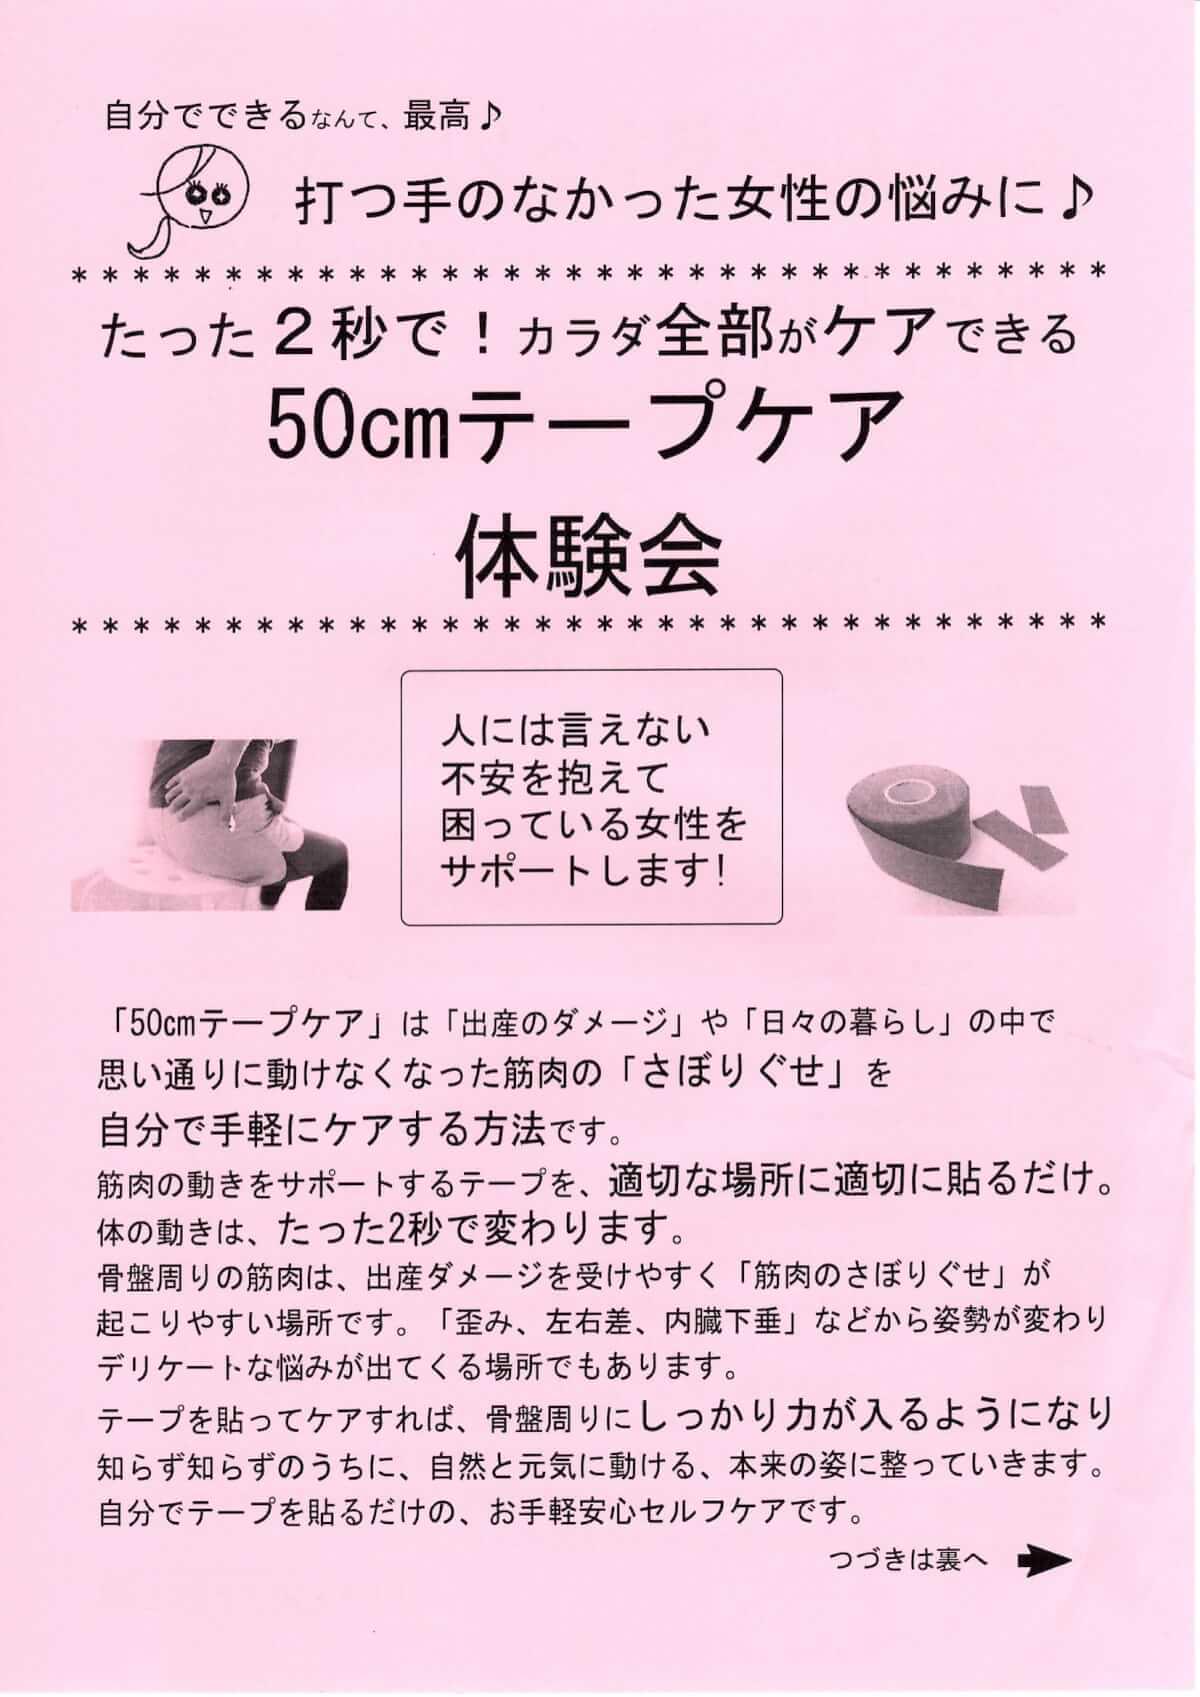 50cmテープケア体験会